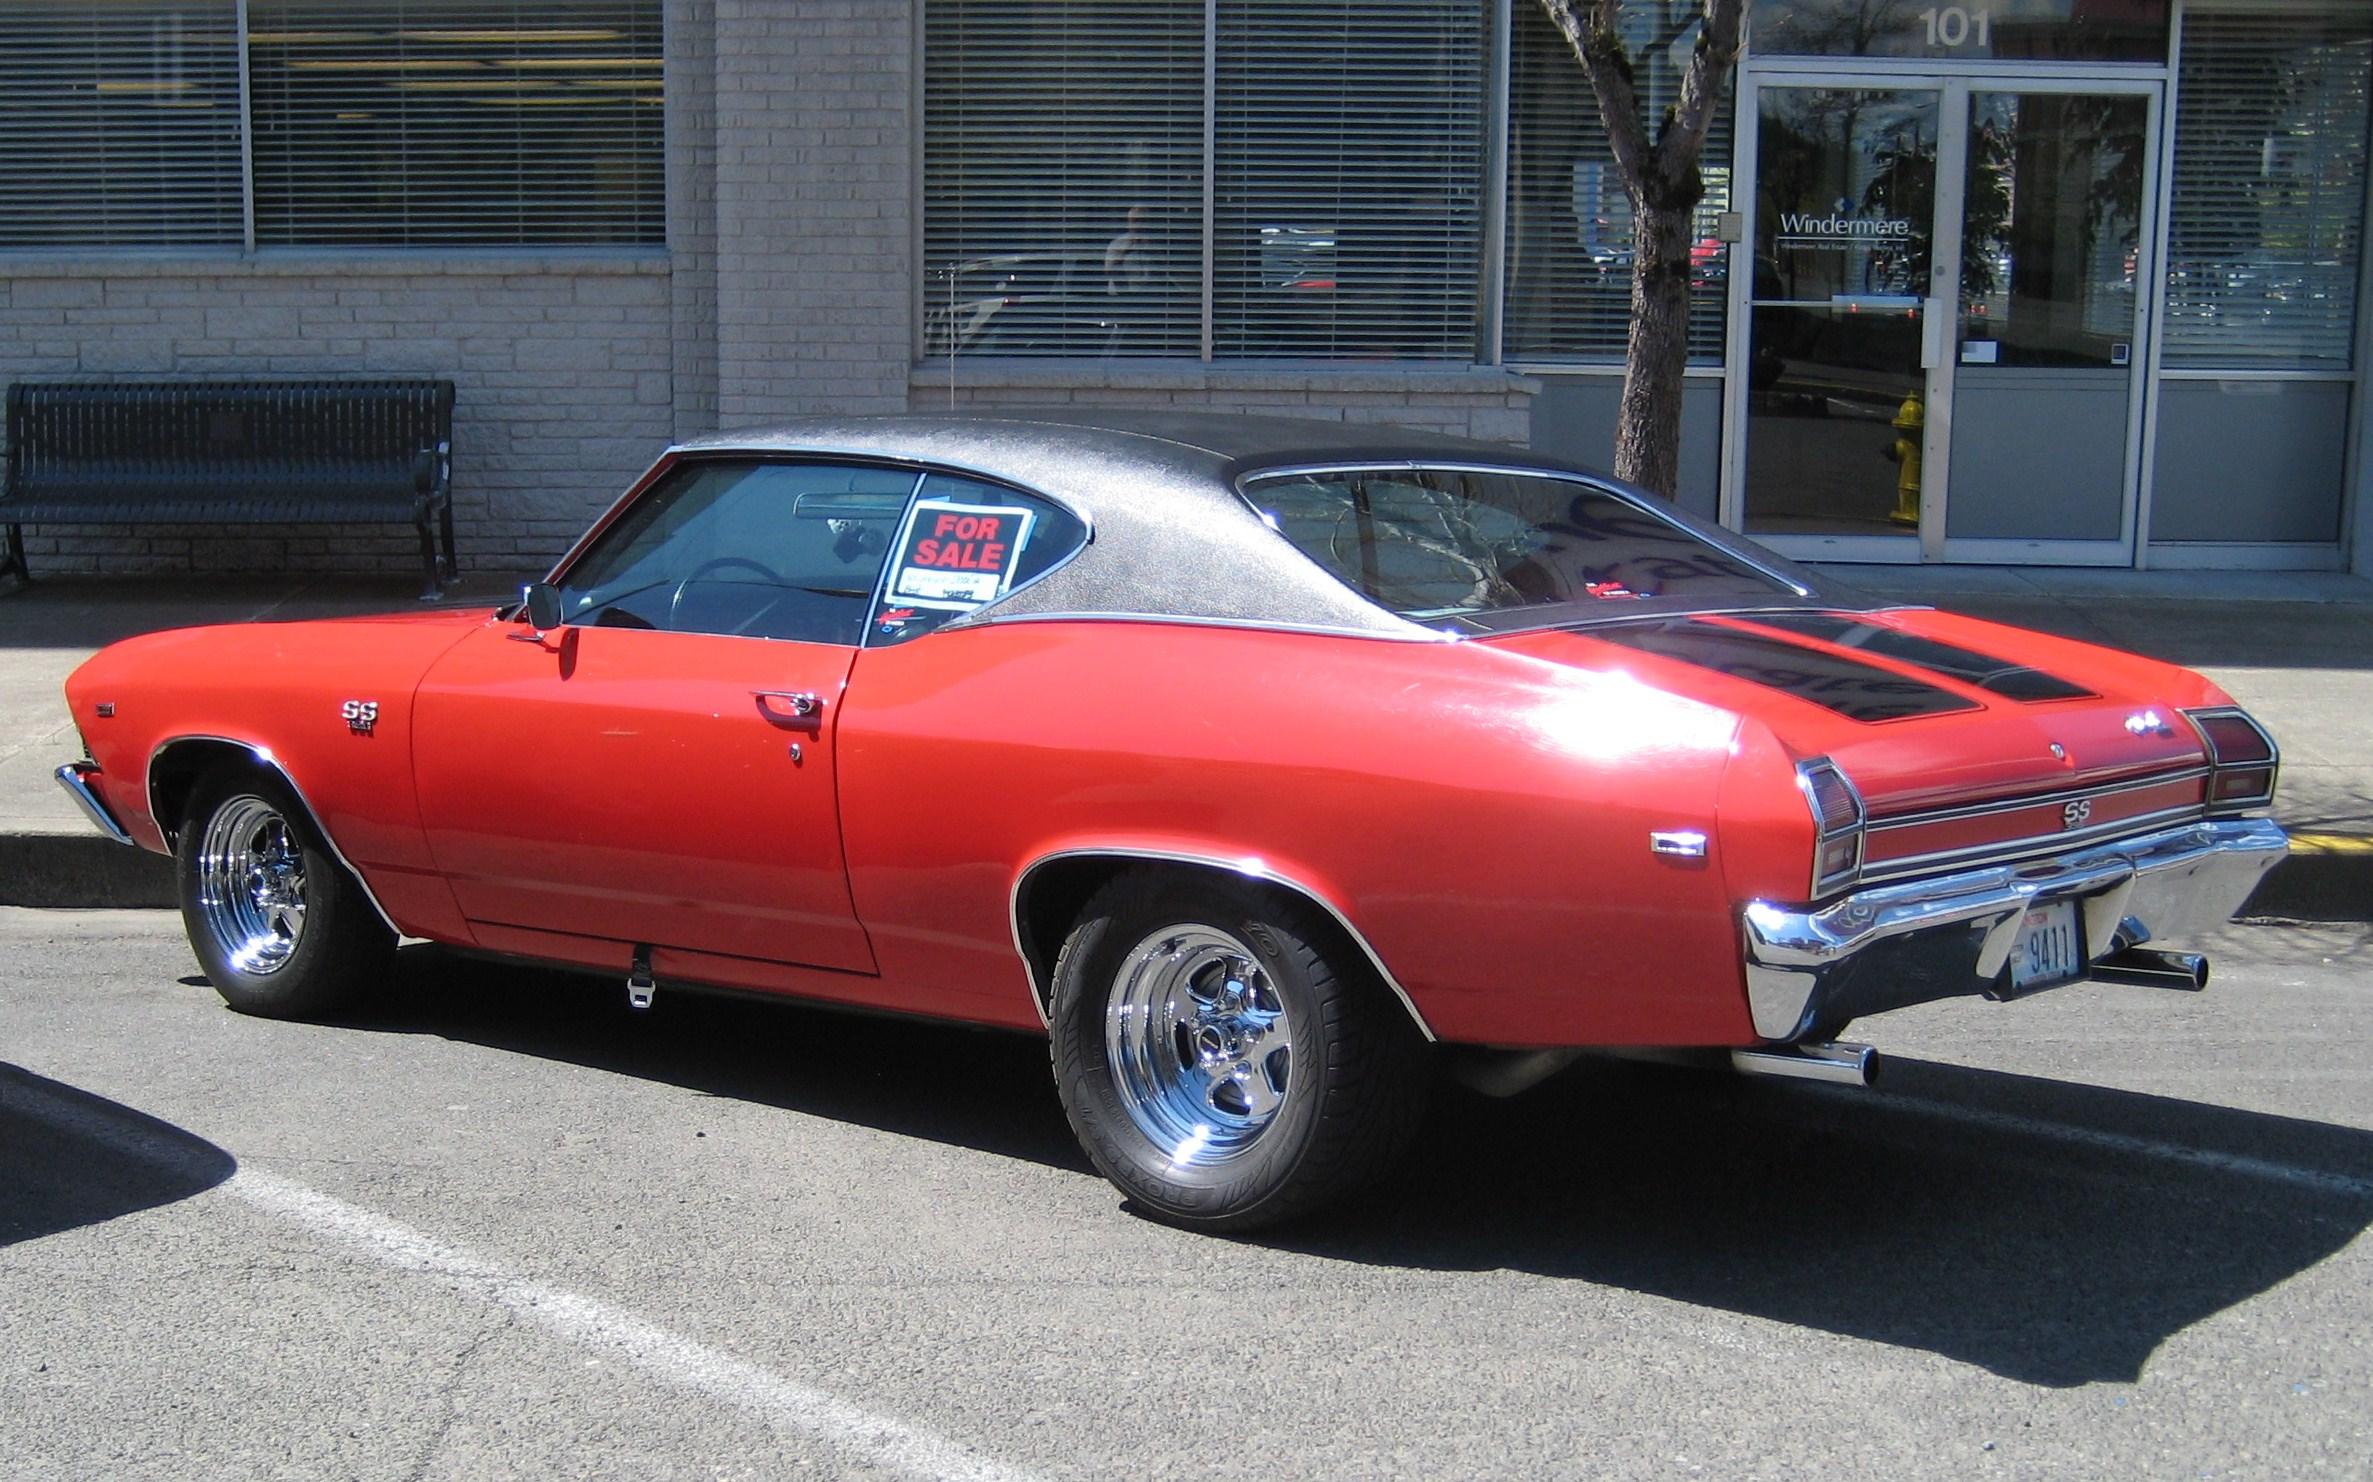 1972 Impala For Sale On Craigslist Joy Studio Design Gallery Best Design